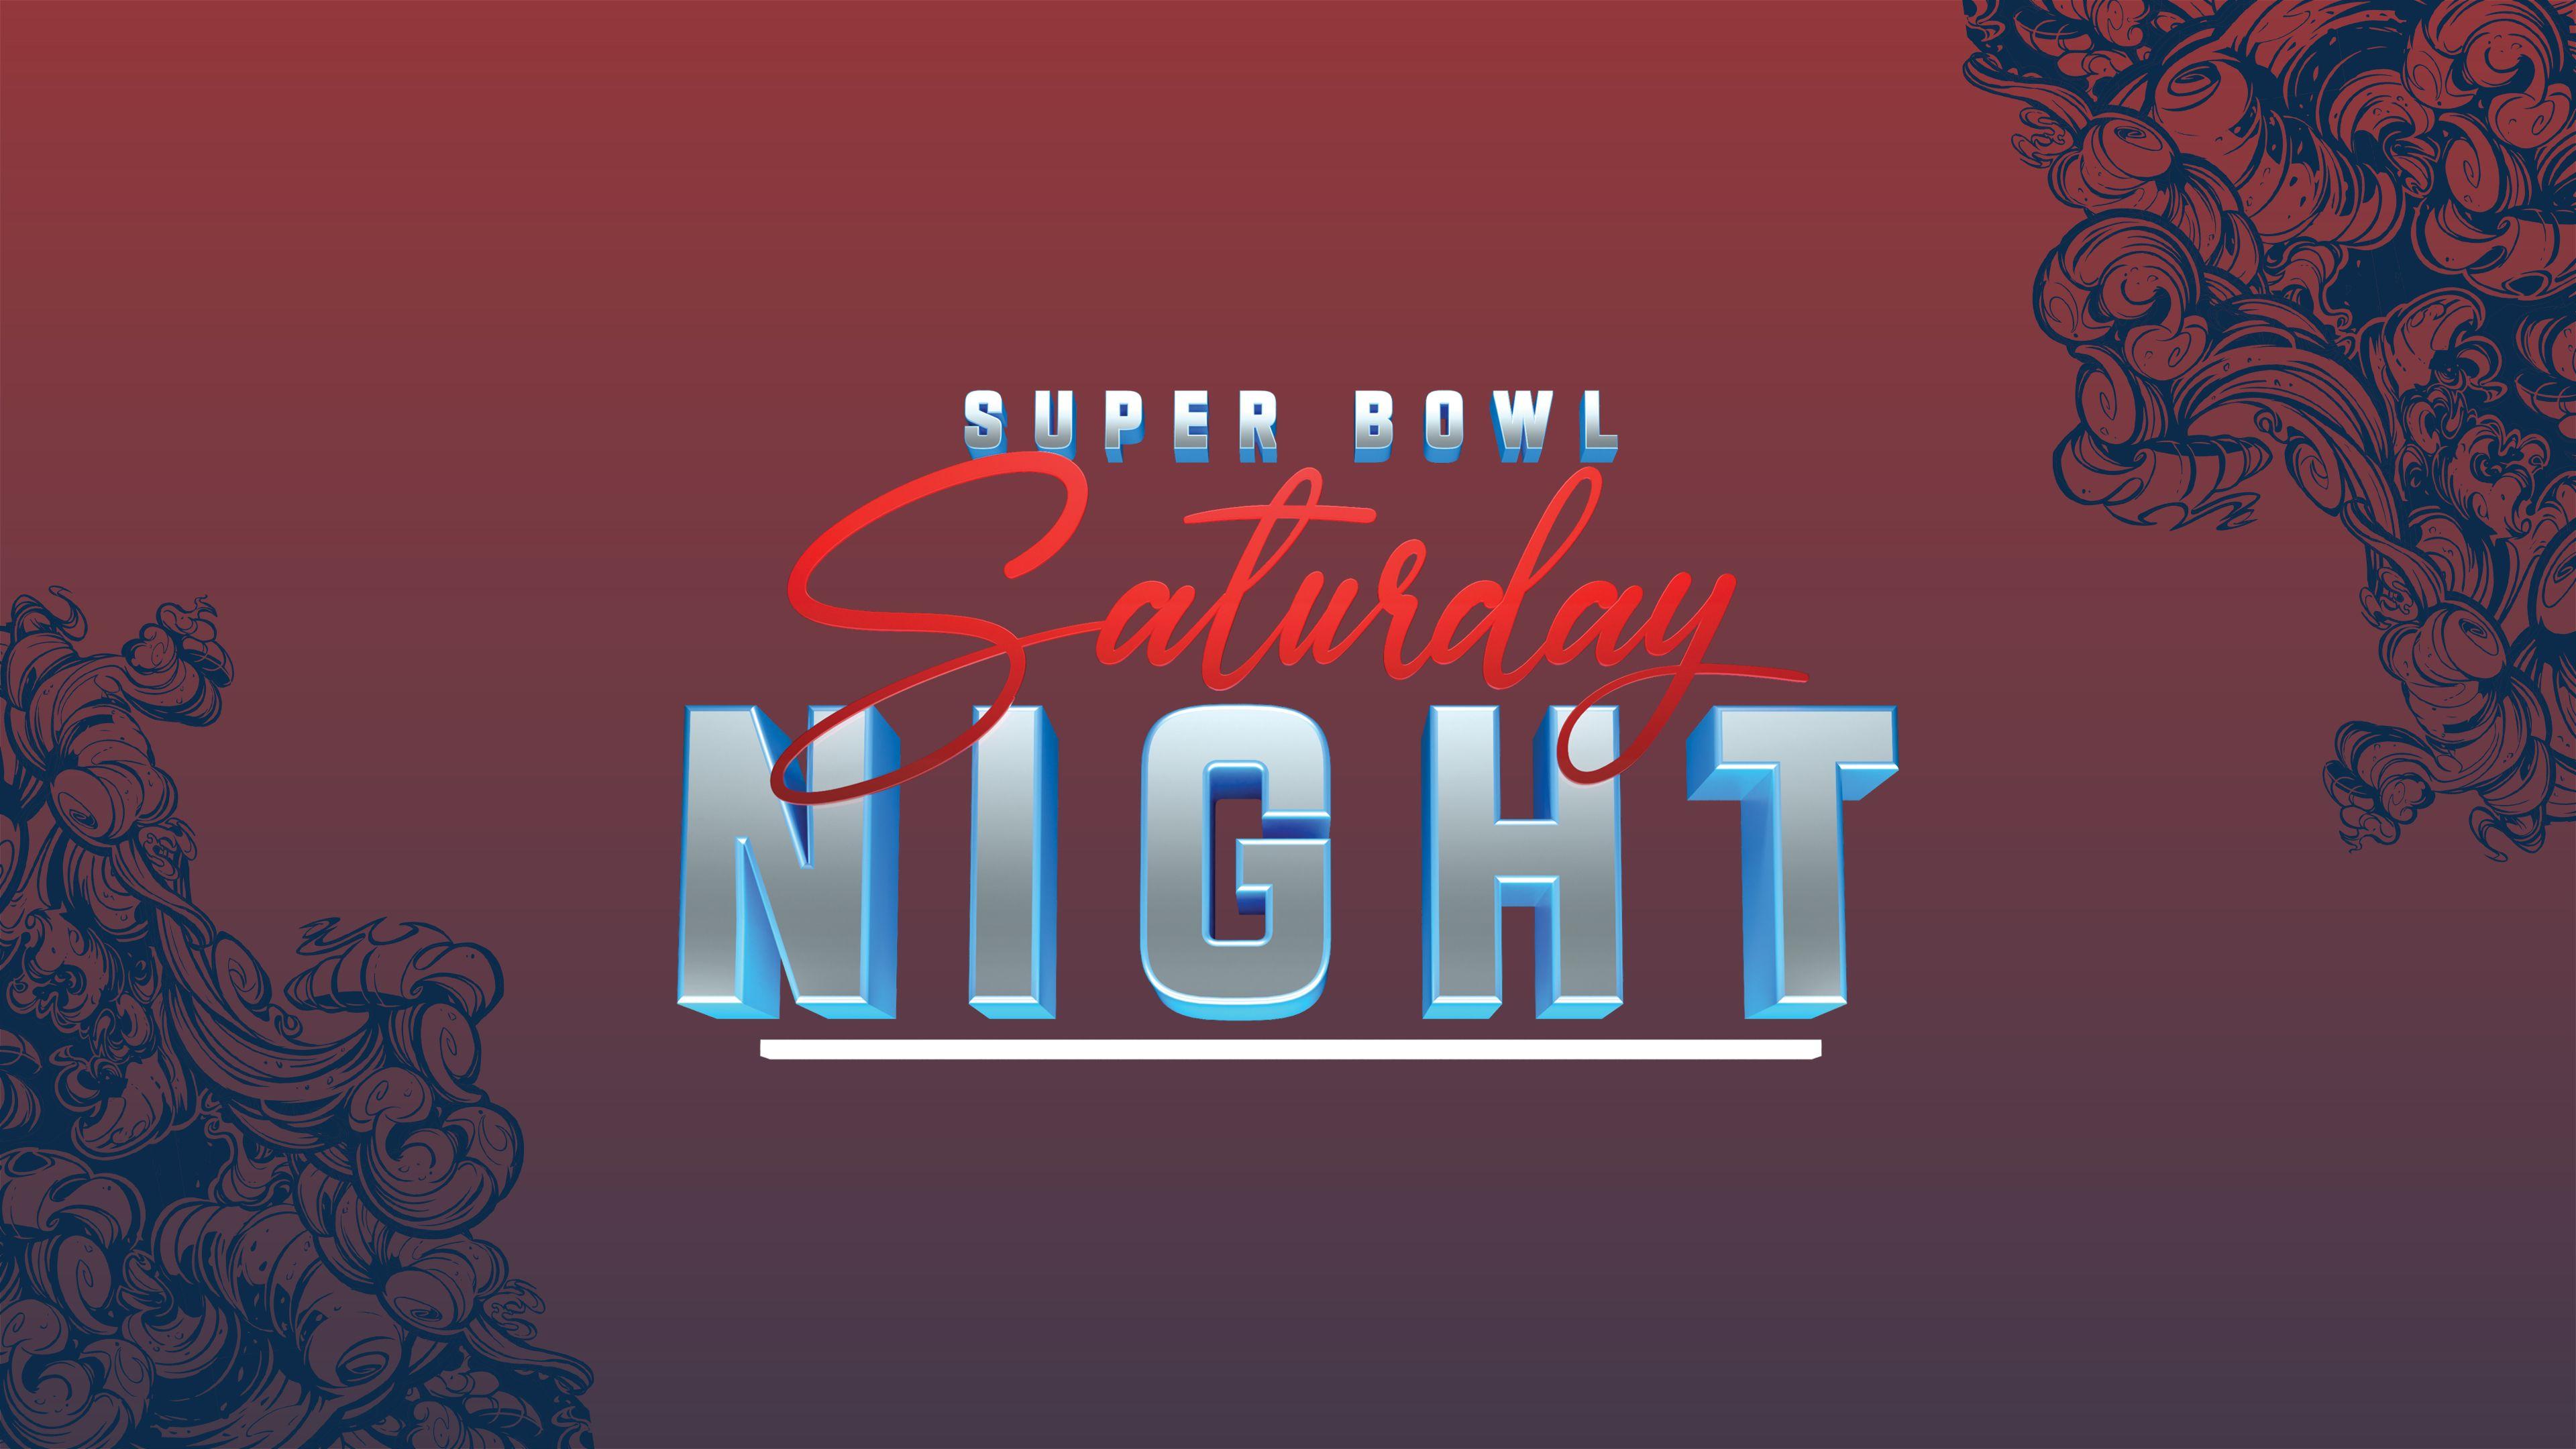 Super Bowl Saturday Night